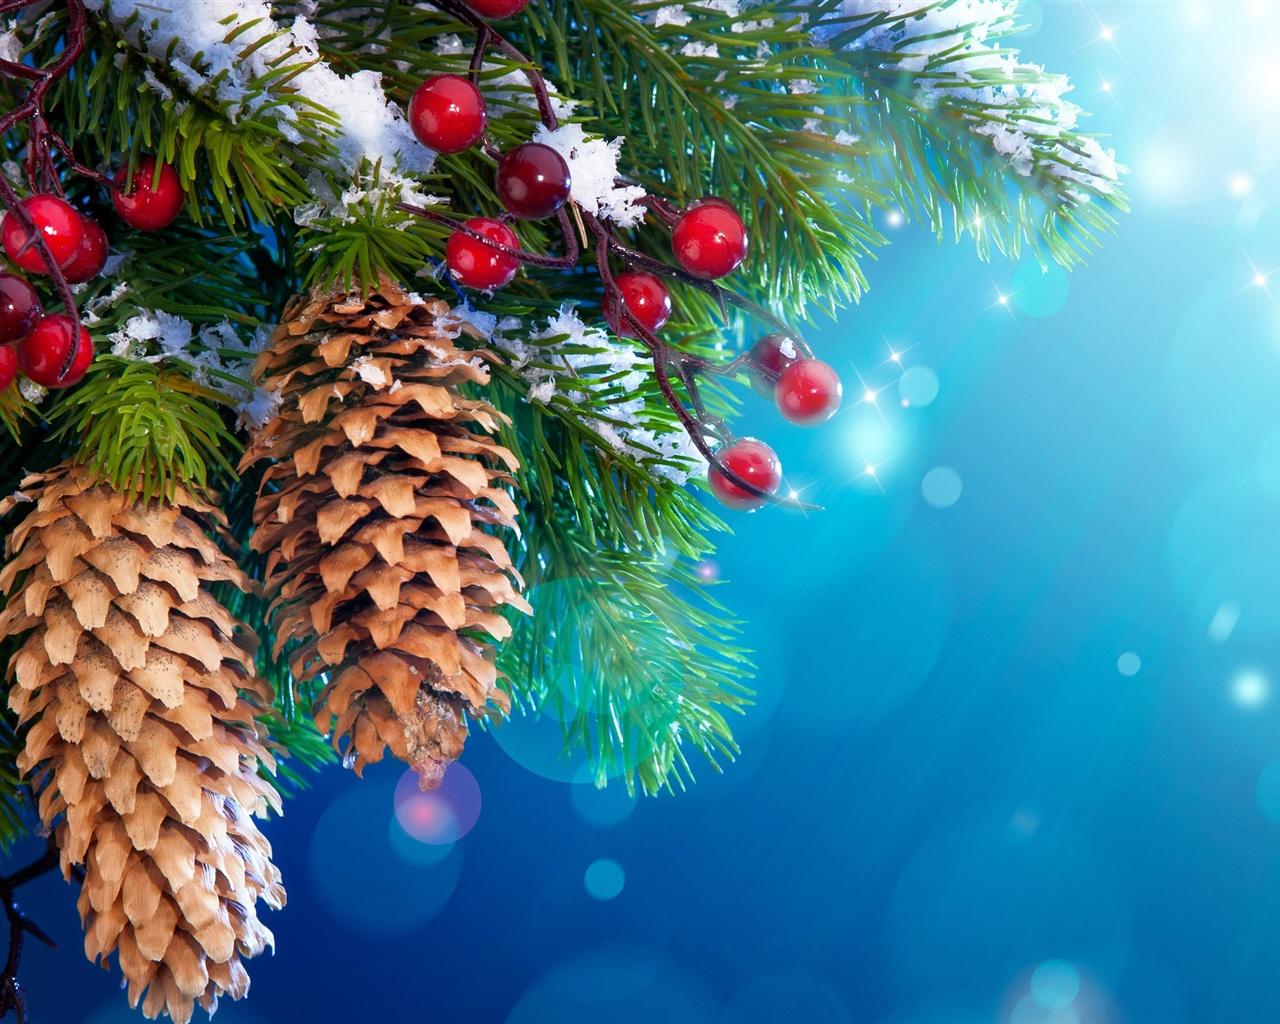 christmas tree desktop wallpaper 1280x1024 - photo #39